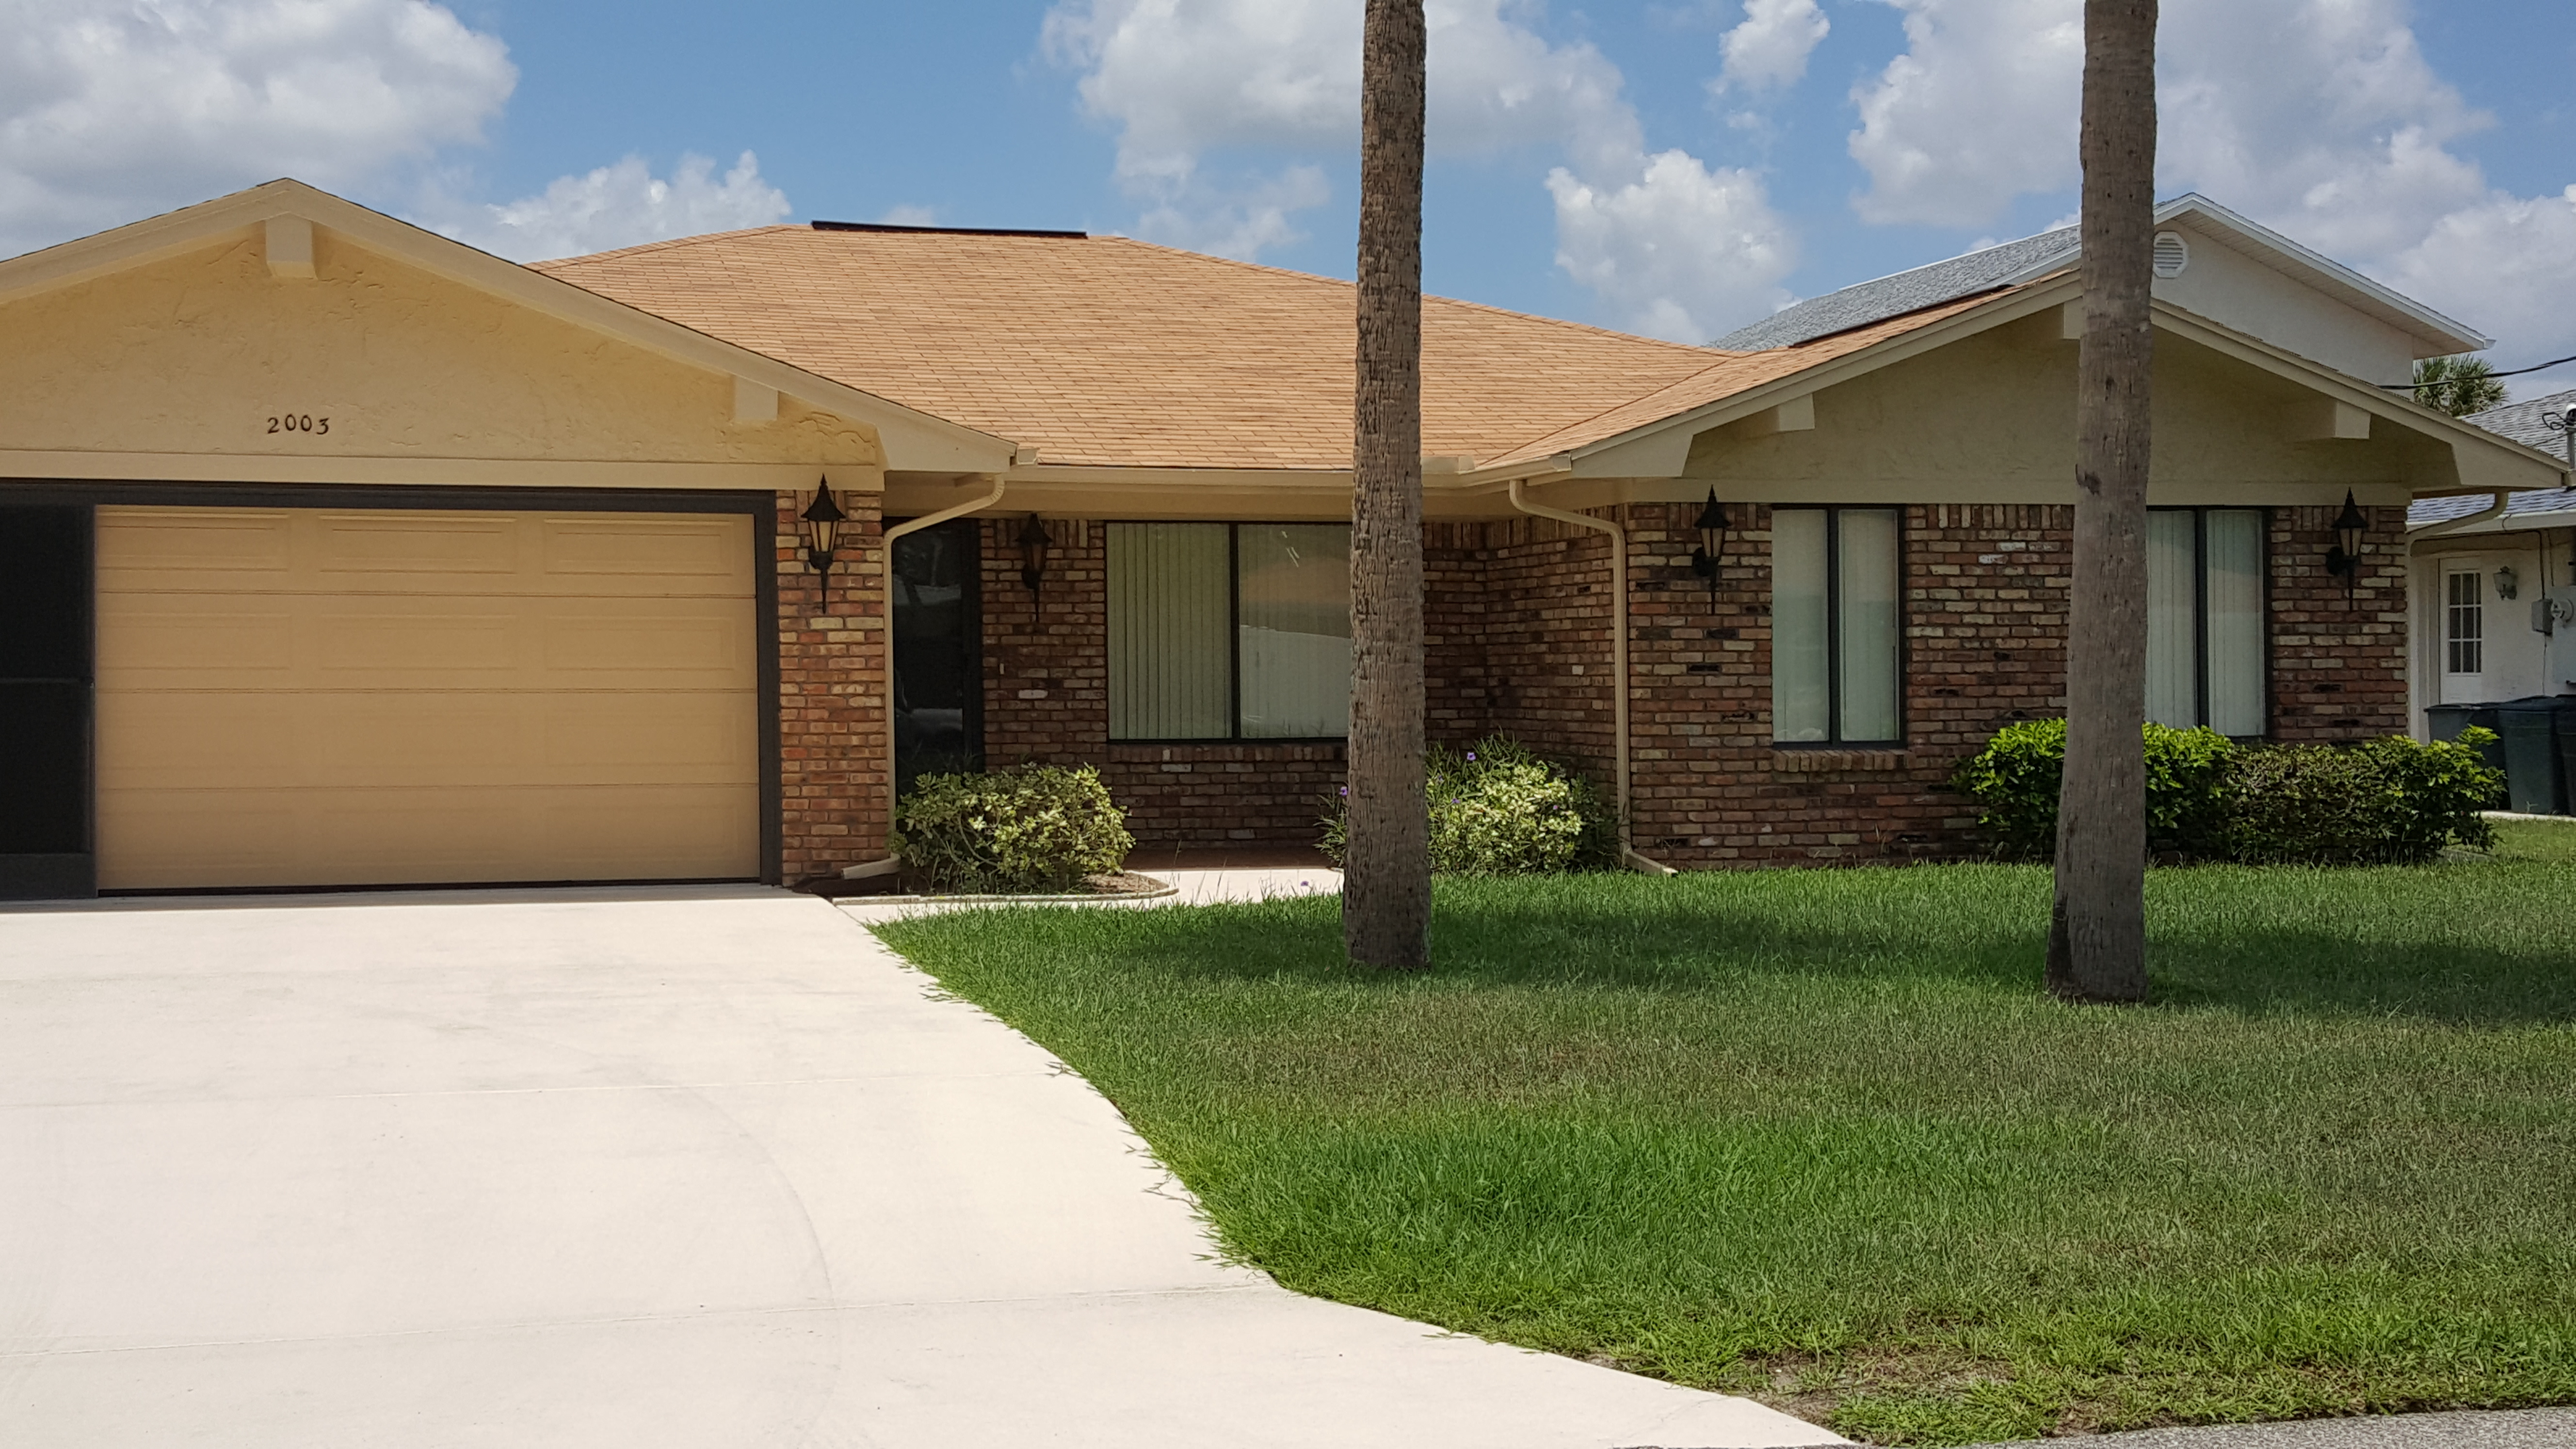 2003 N. Daytona Ave, Flagler Beach, FL